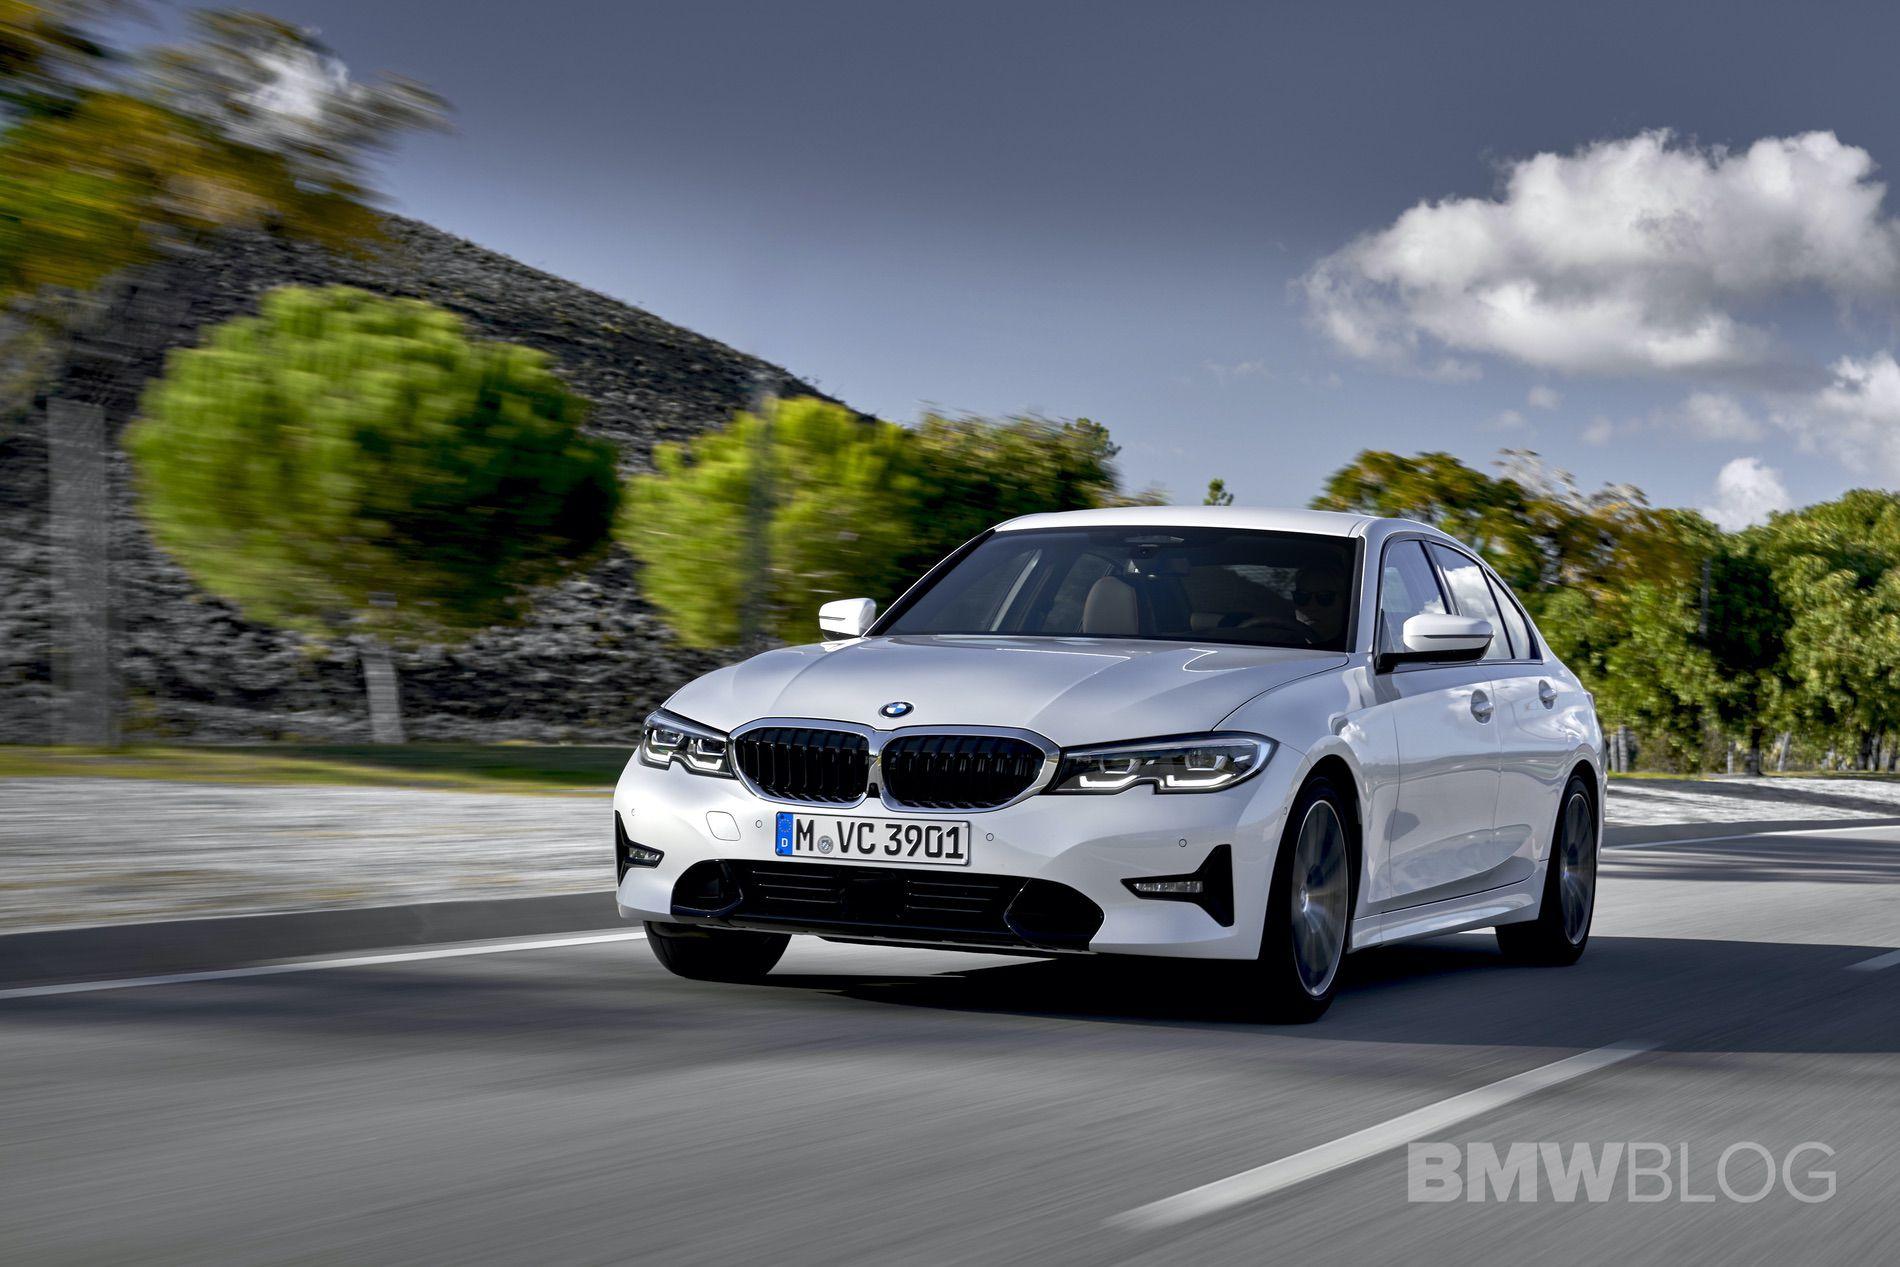 2019-BMW-320d-G20-test-drive-62.jpg